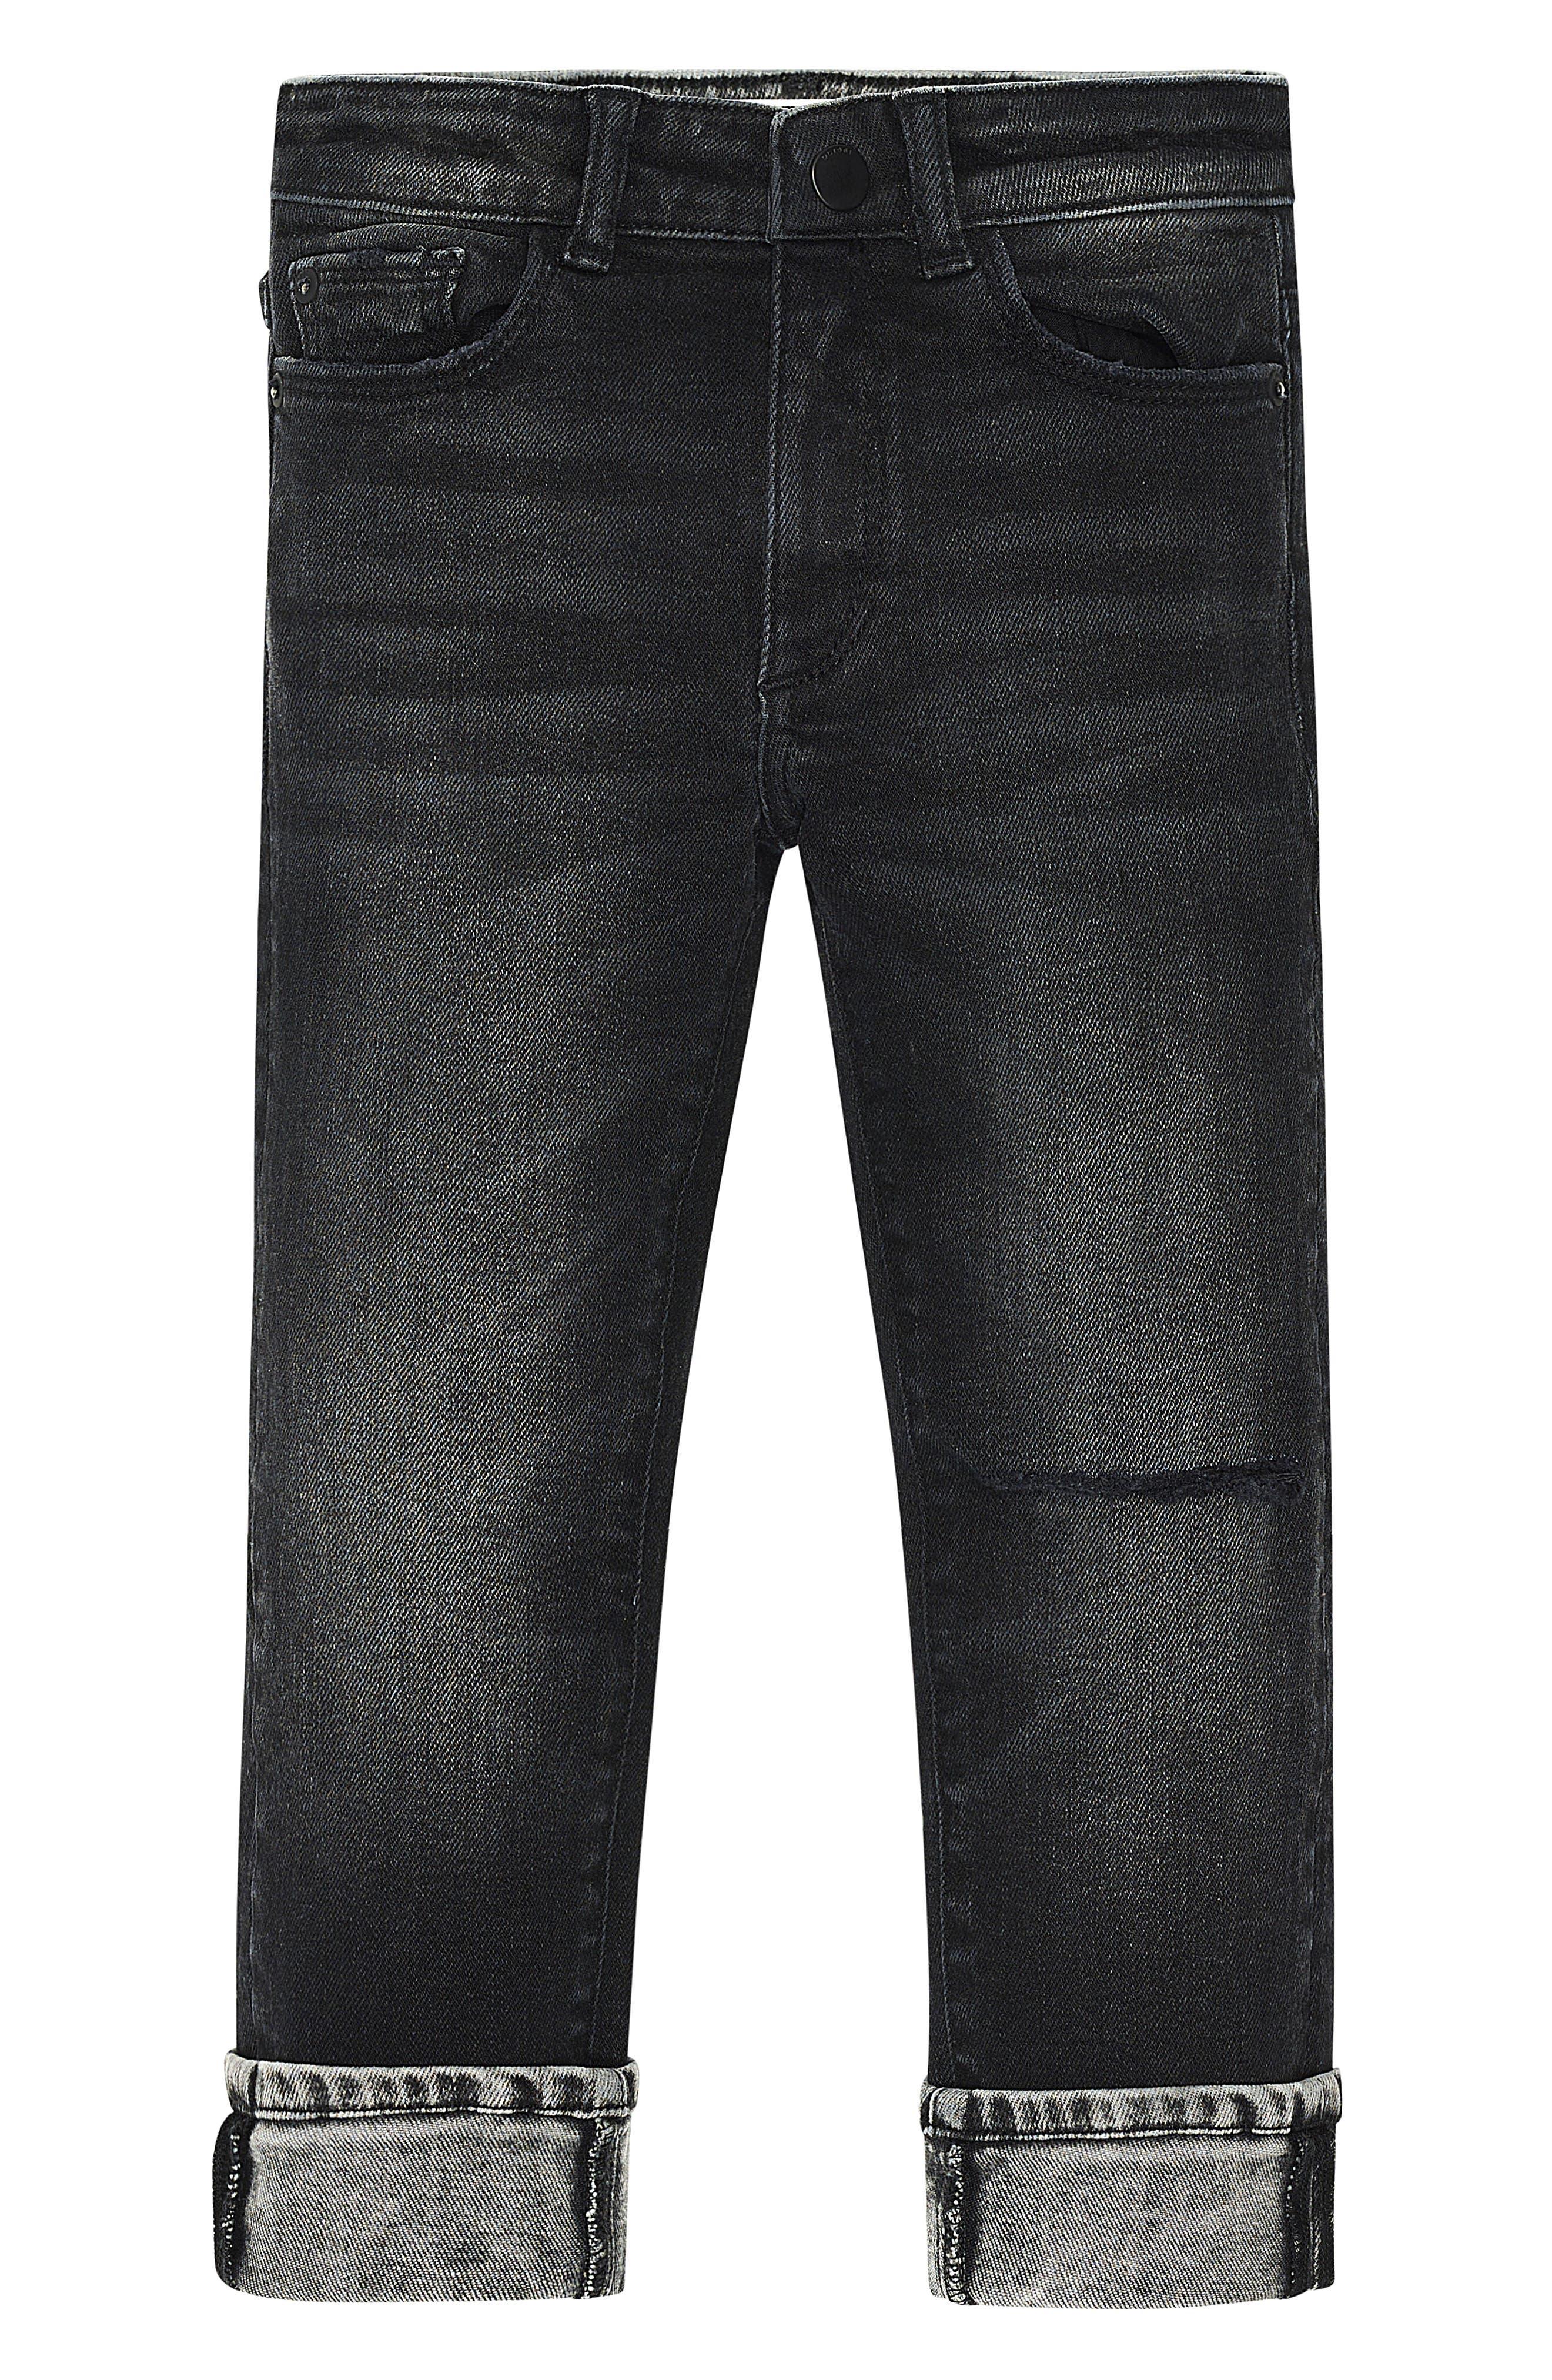 Alternate Image 3  - DL1961 Hawke Skinny Jeans (Toddler Boys & Little Boys)